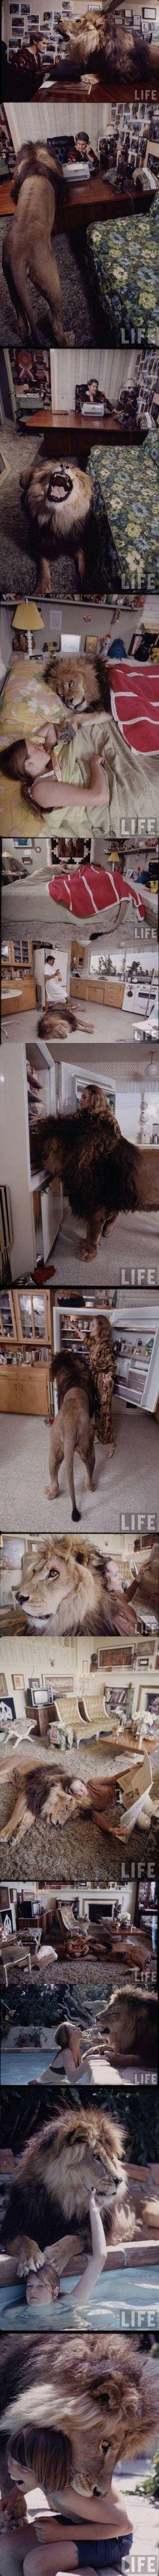 Family pet?! What. Haha! #lion